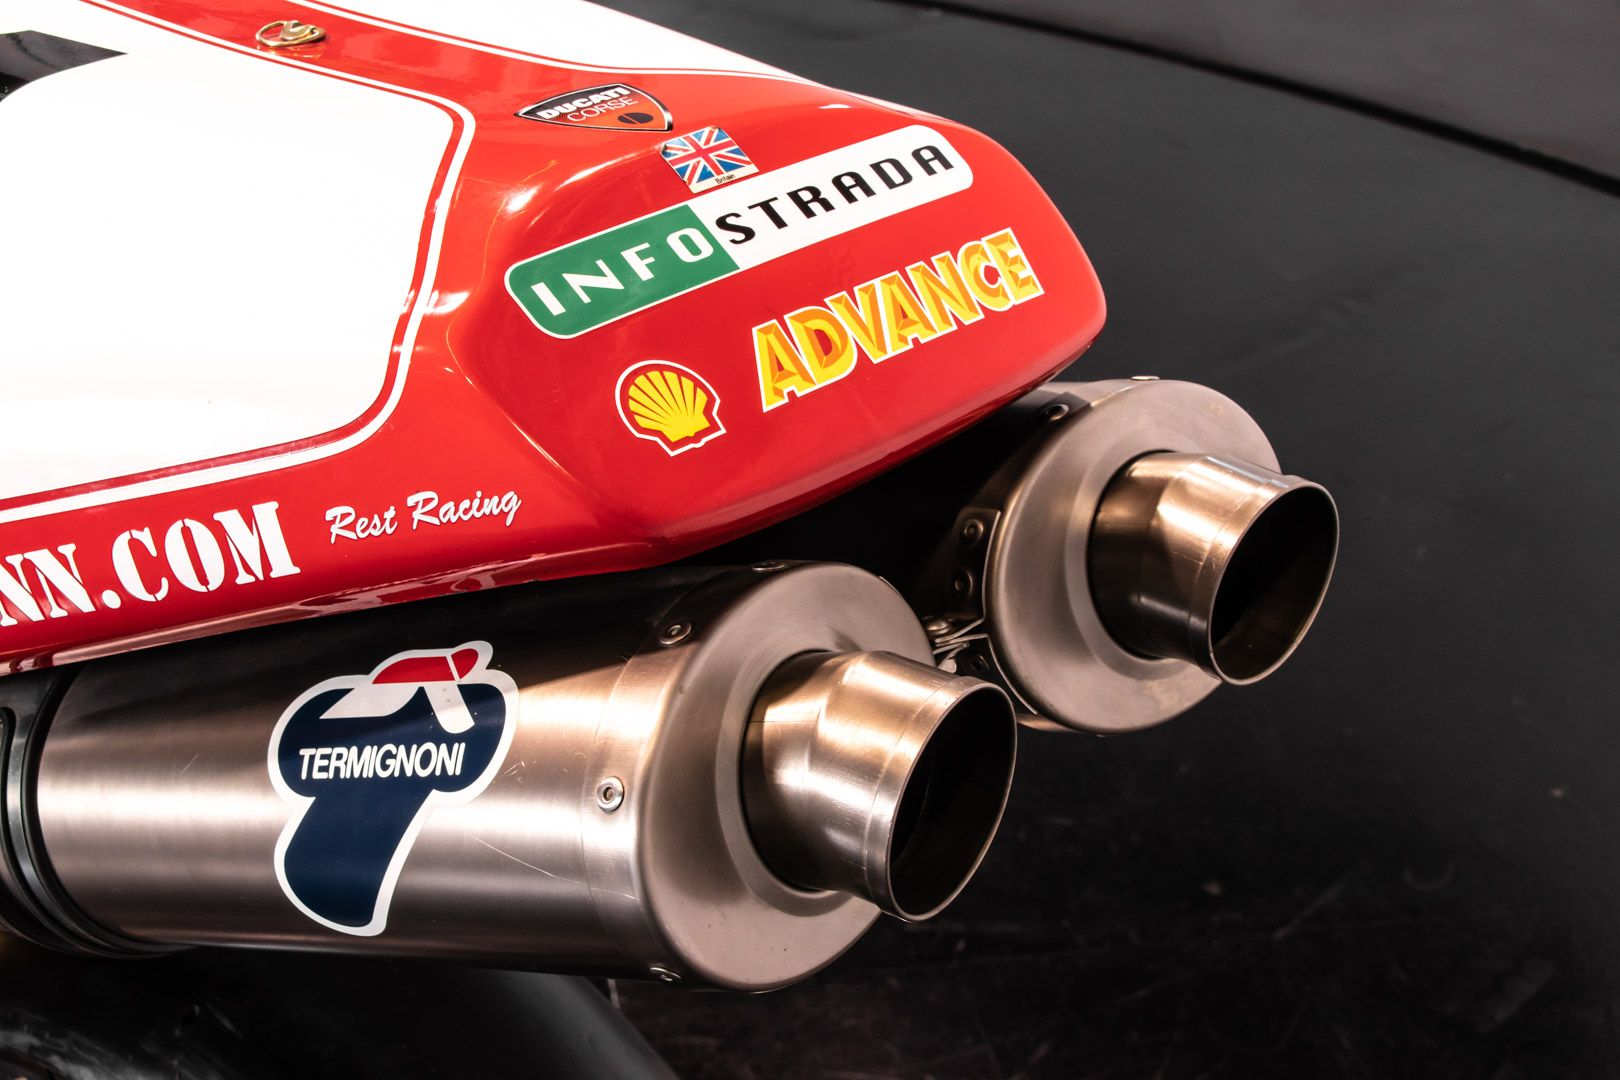 2008 Ducati 996 Fogarty Evocation 03/12 84235